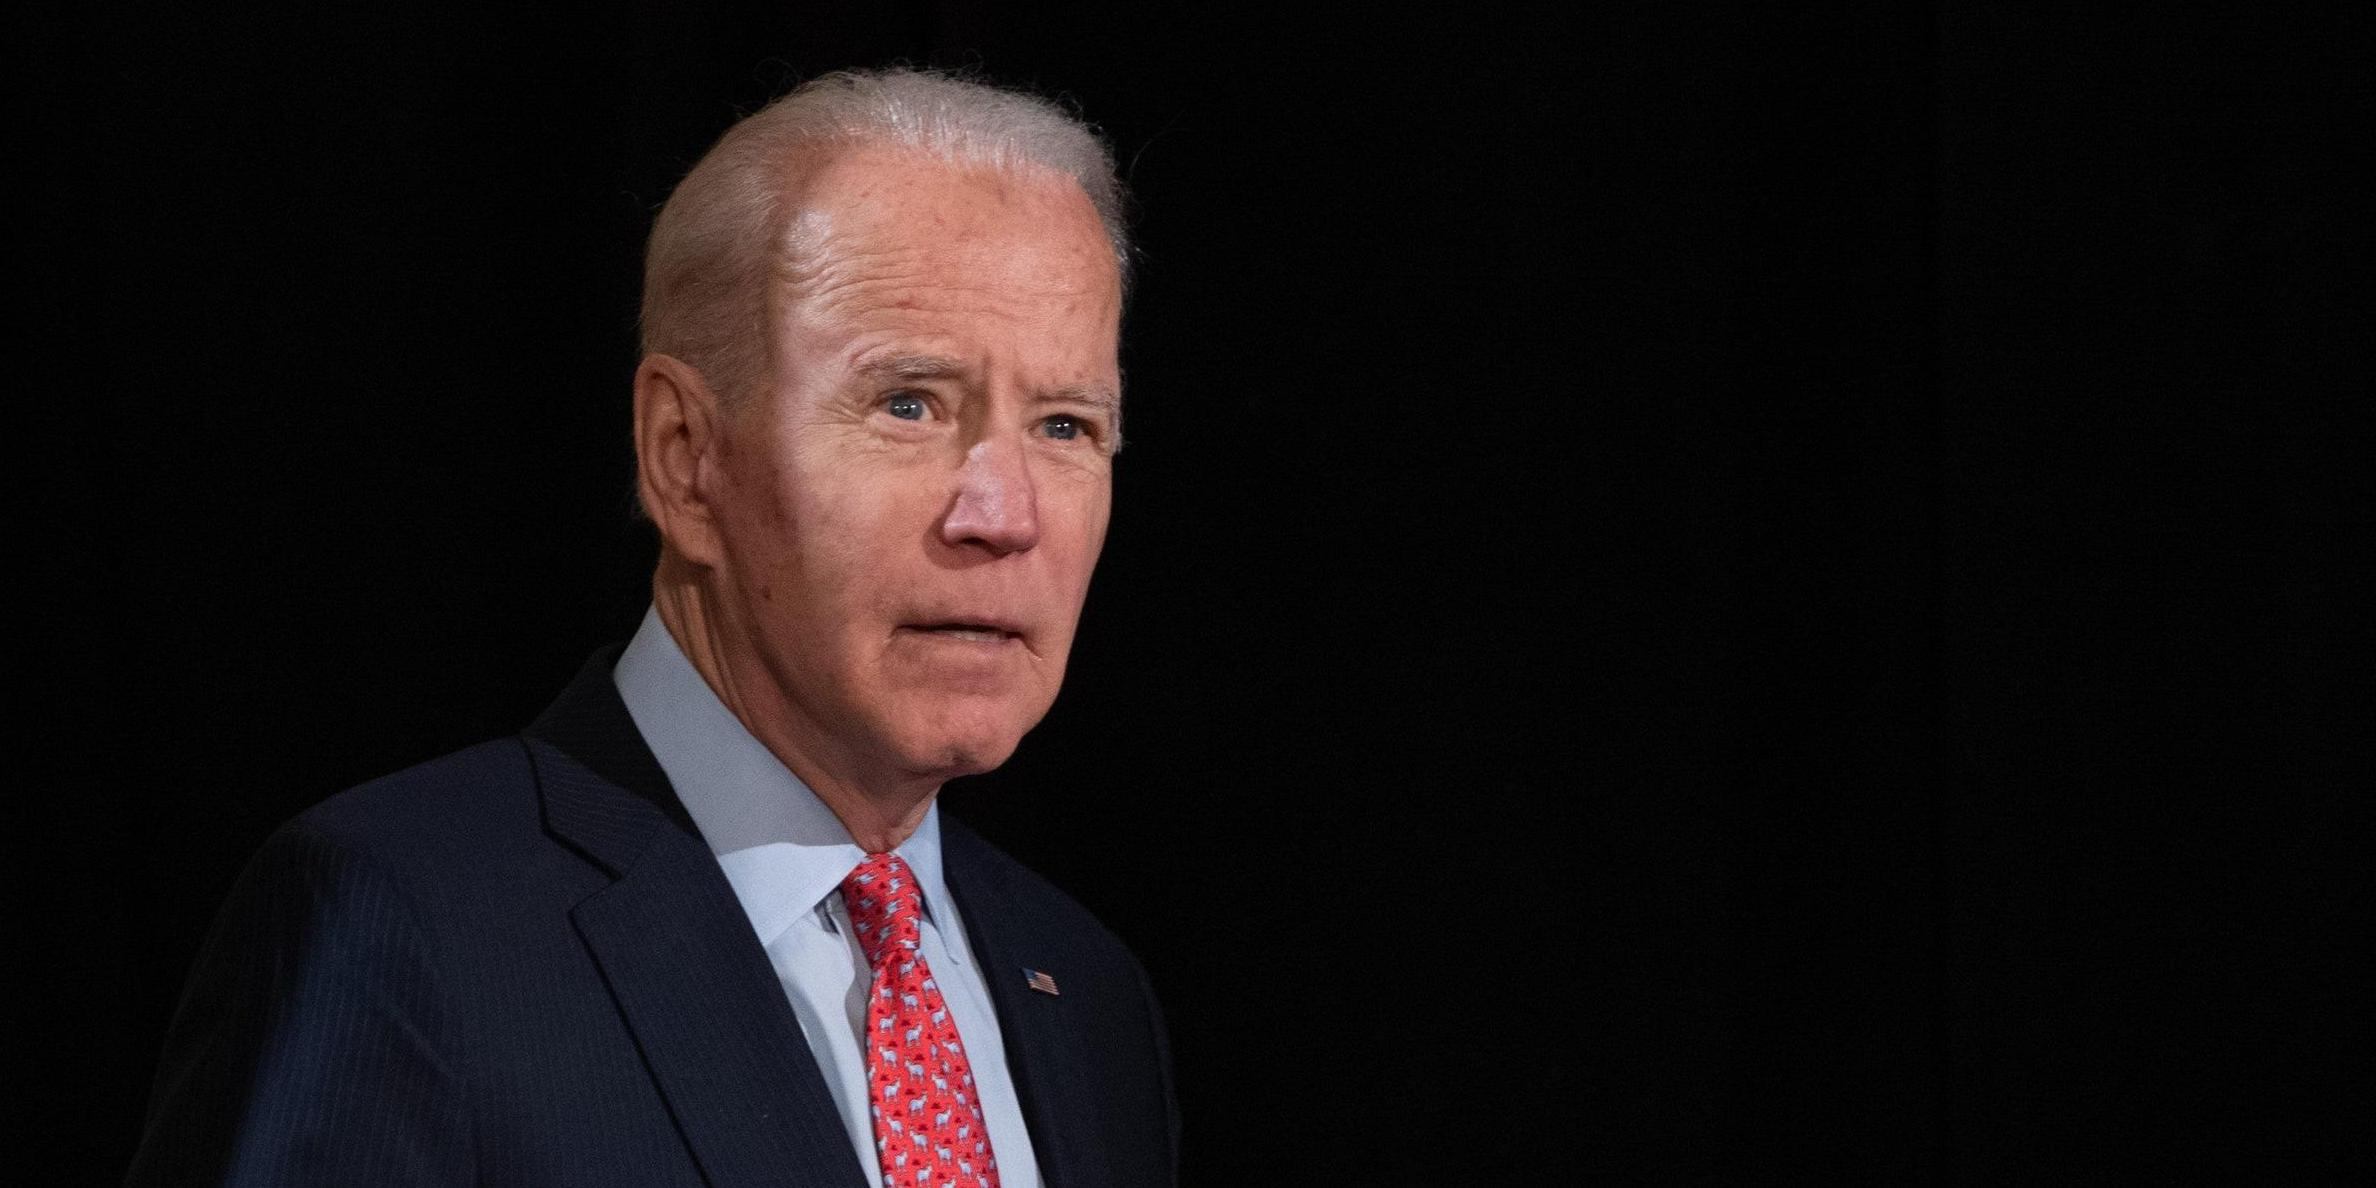 Joe Biden's Climate Change Record Doesn't Match His Rhetoric